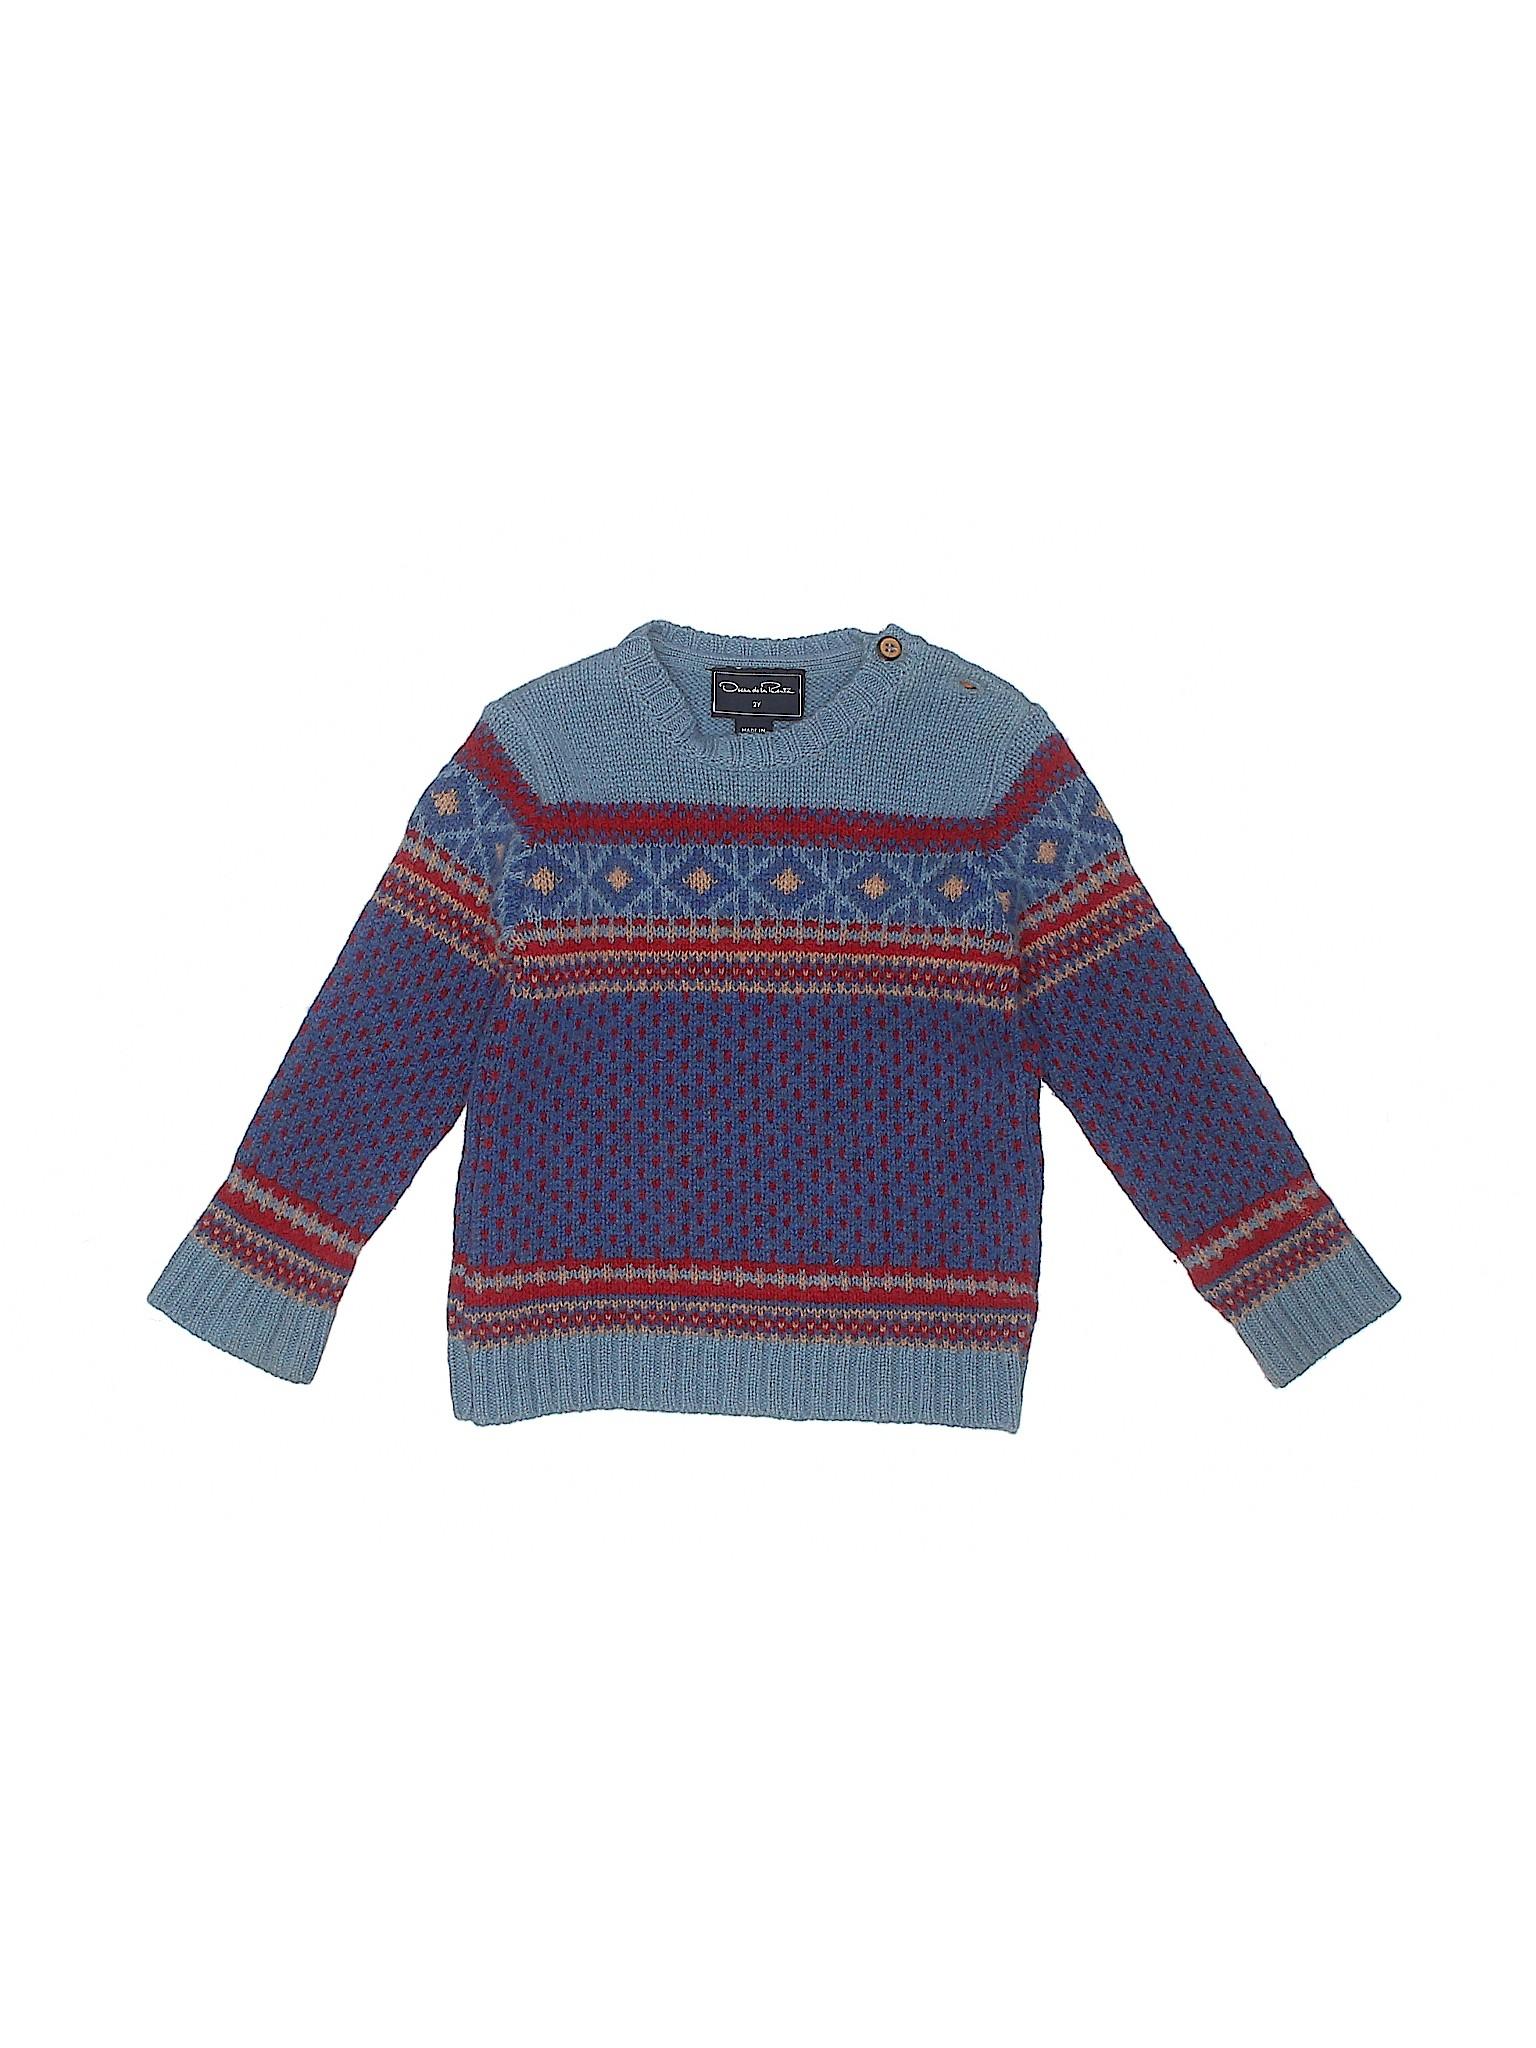 1fc88ed523b Oscar De La Renta 100% Virgin Wool Print Dark Blue Wool Pullover ...